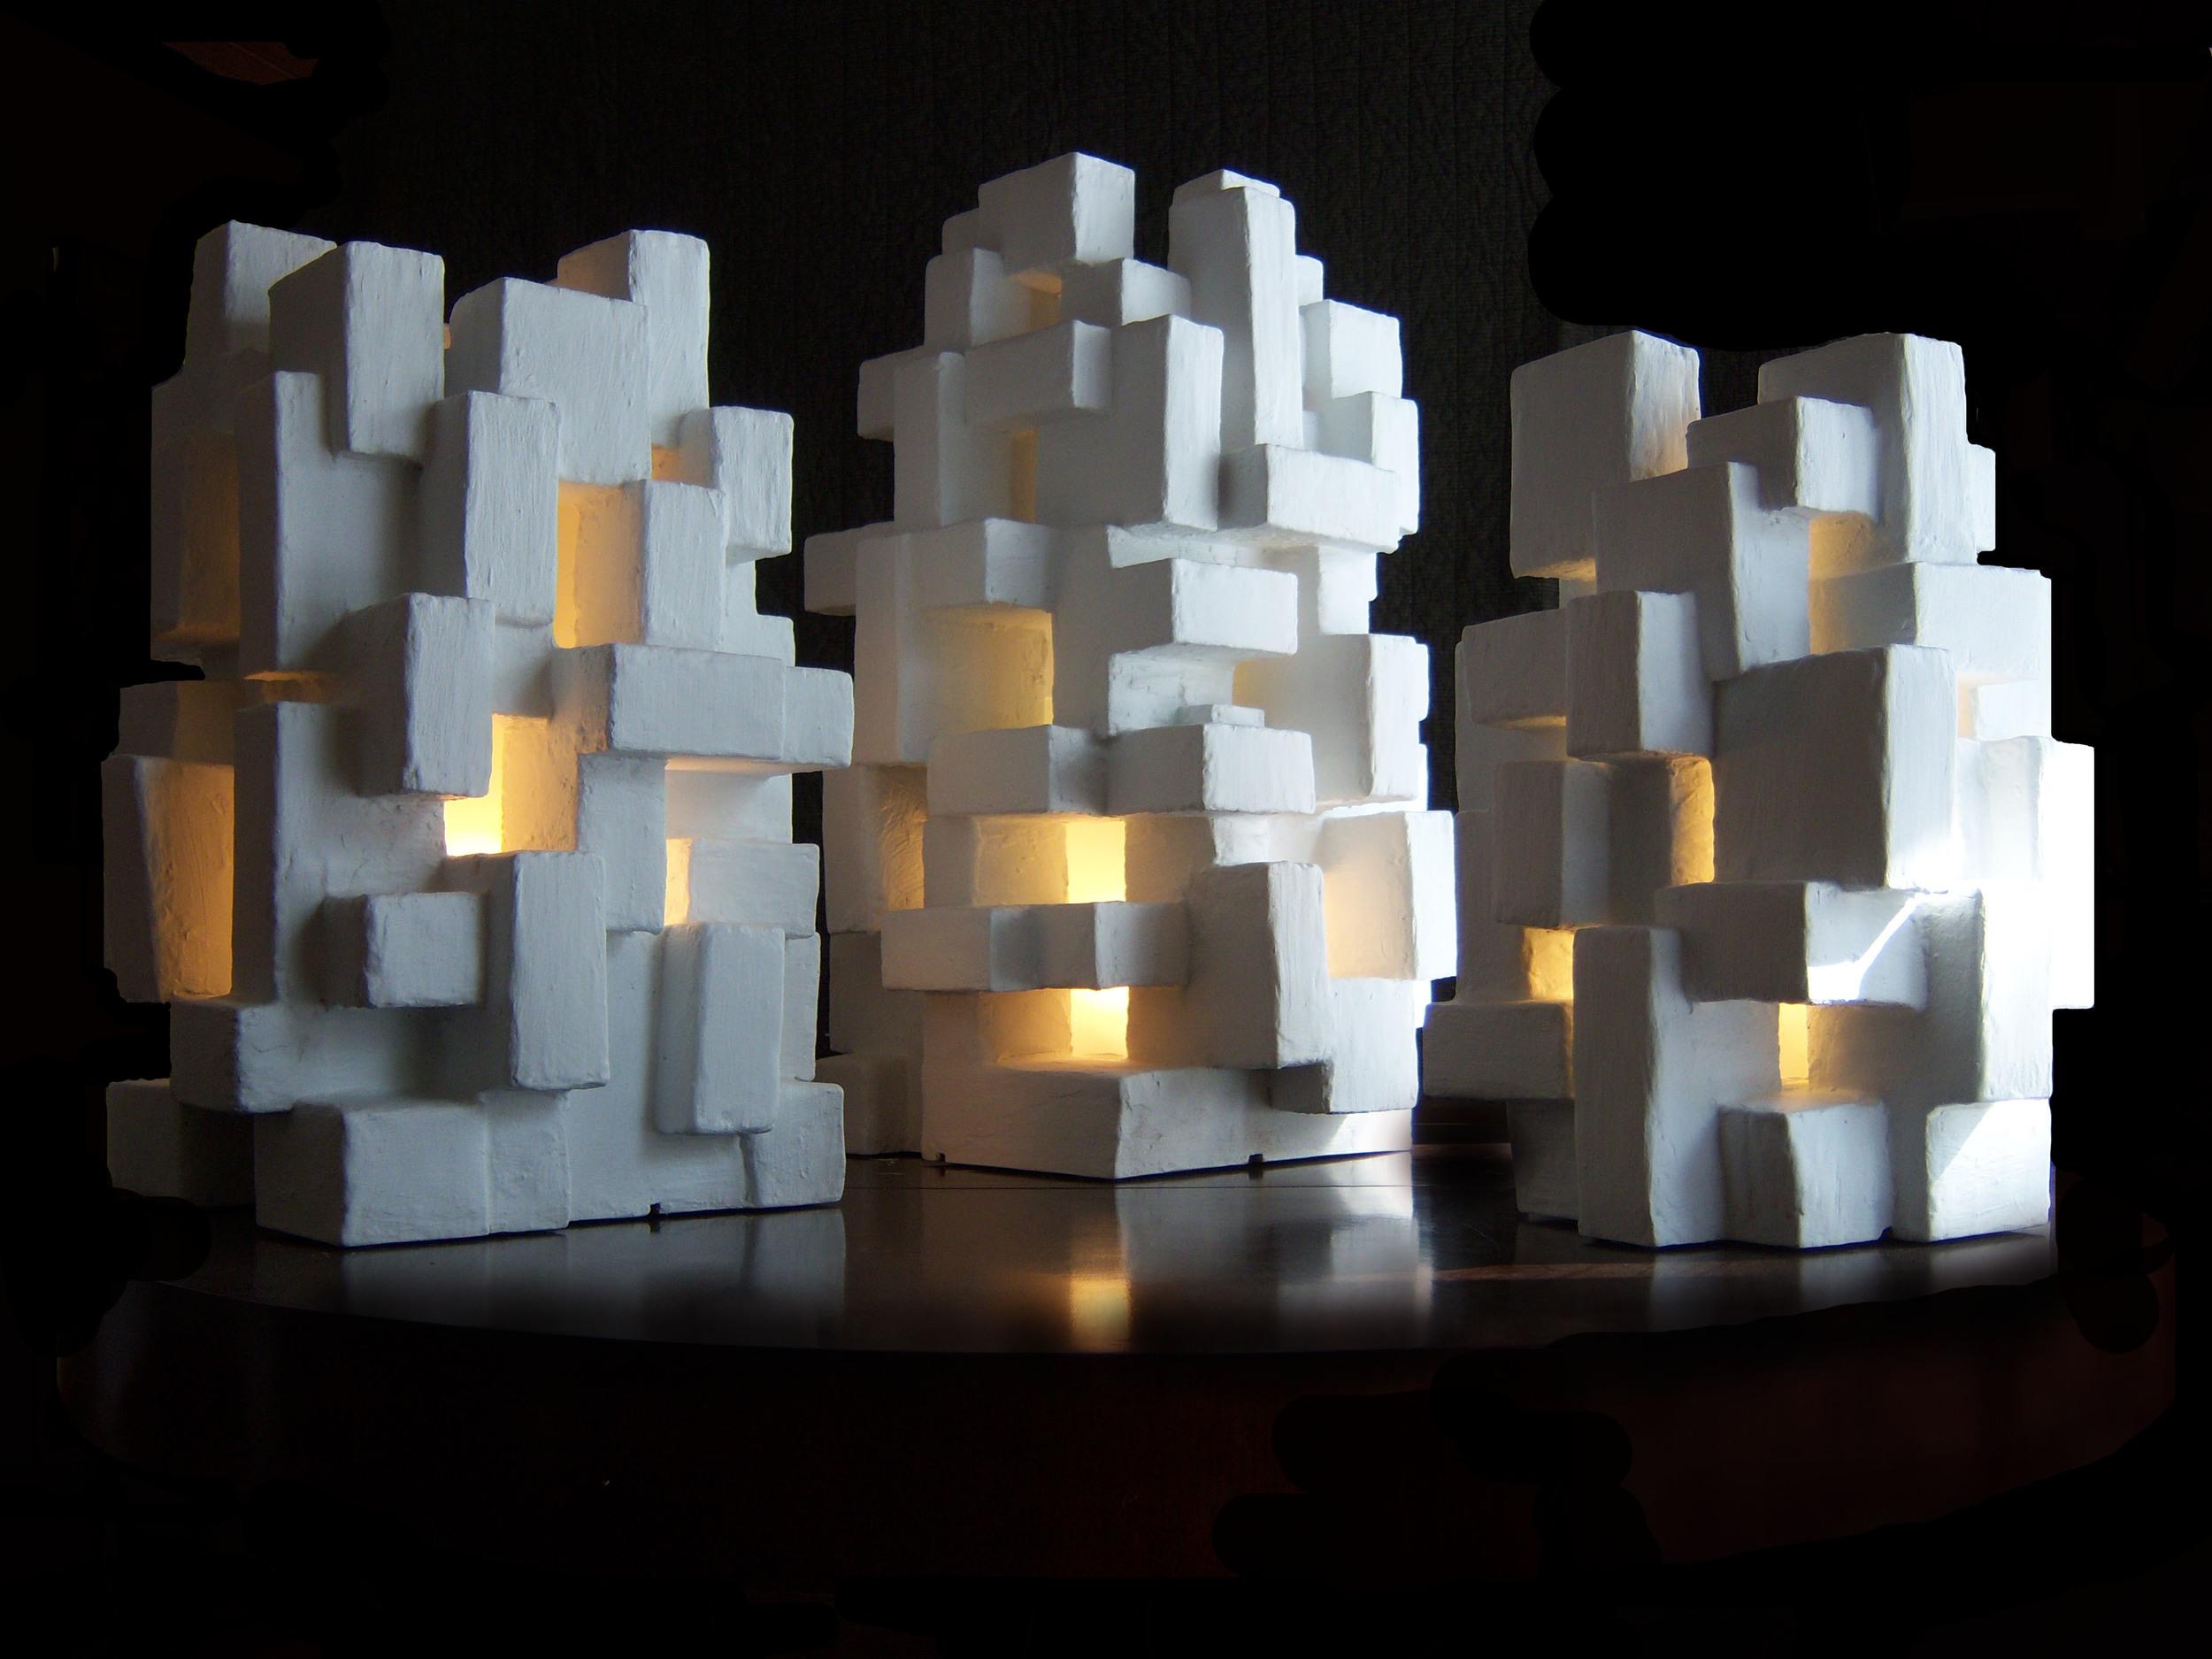 GOTHAM LIGHT SCULPTURES, Mixed Media, sizes vary, 2012